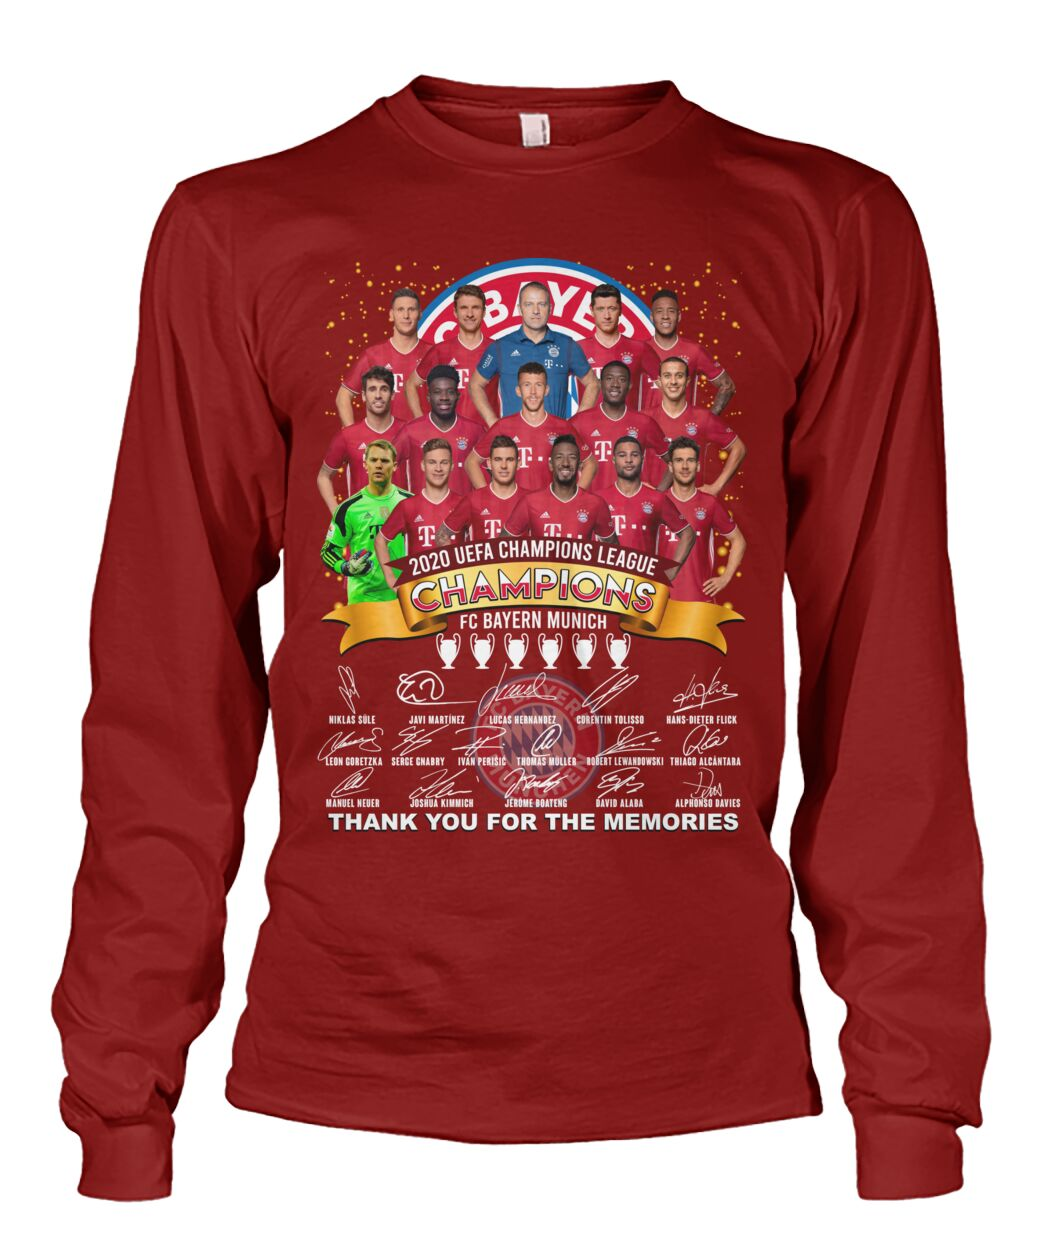 fc bayern munich 2020 uefa champions league thank you for the memories sweatshirt